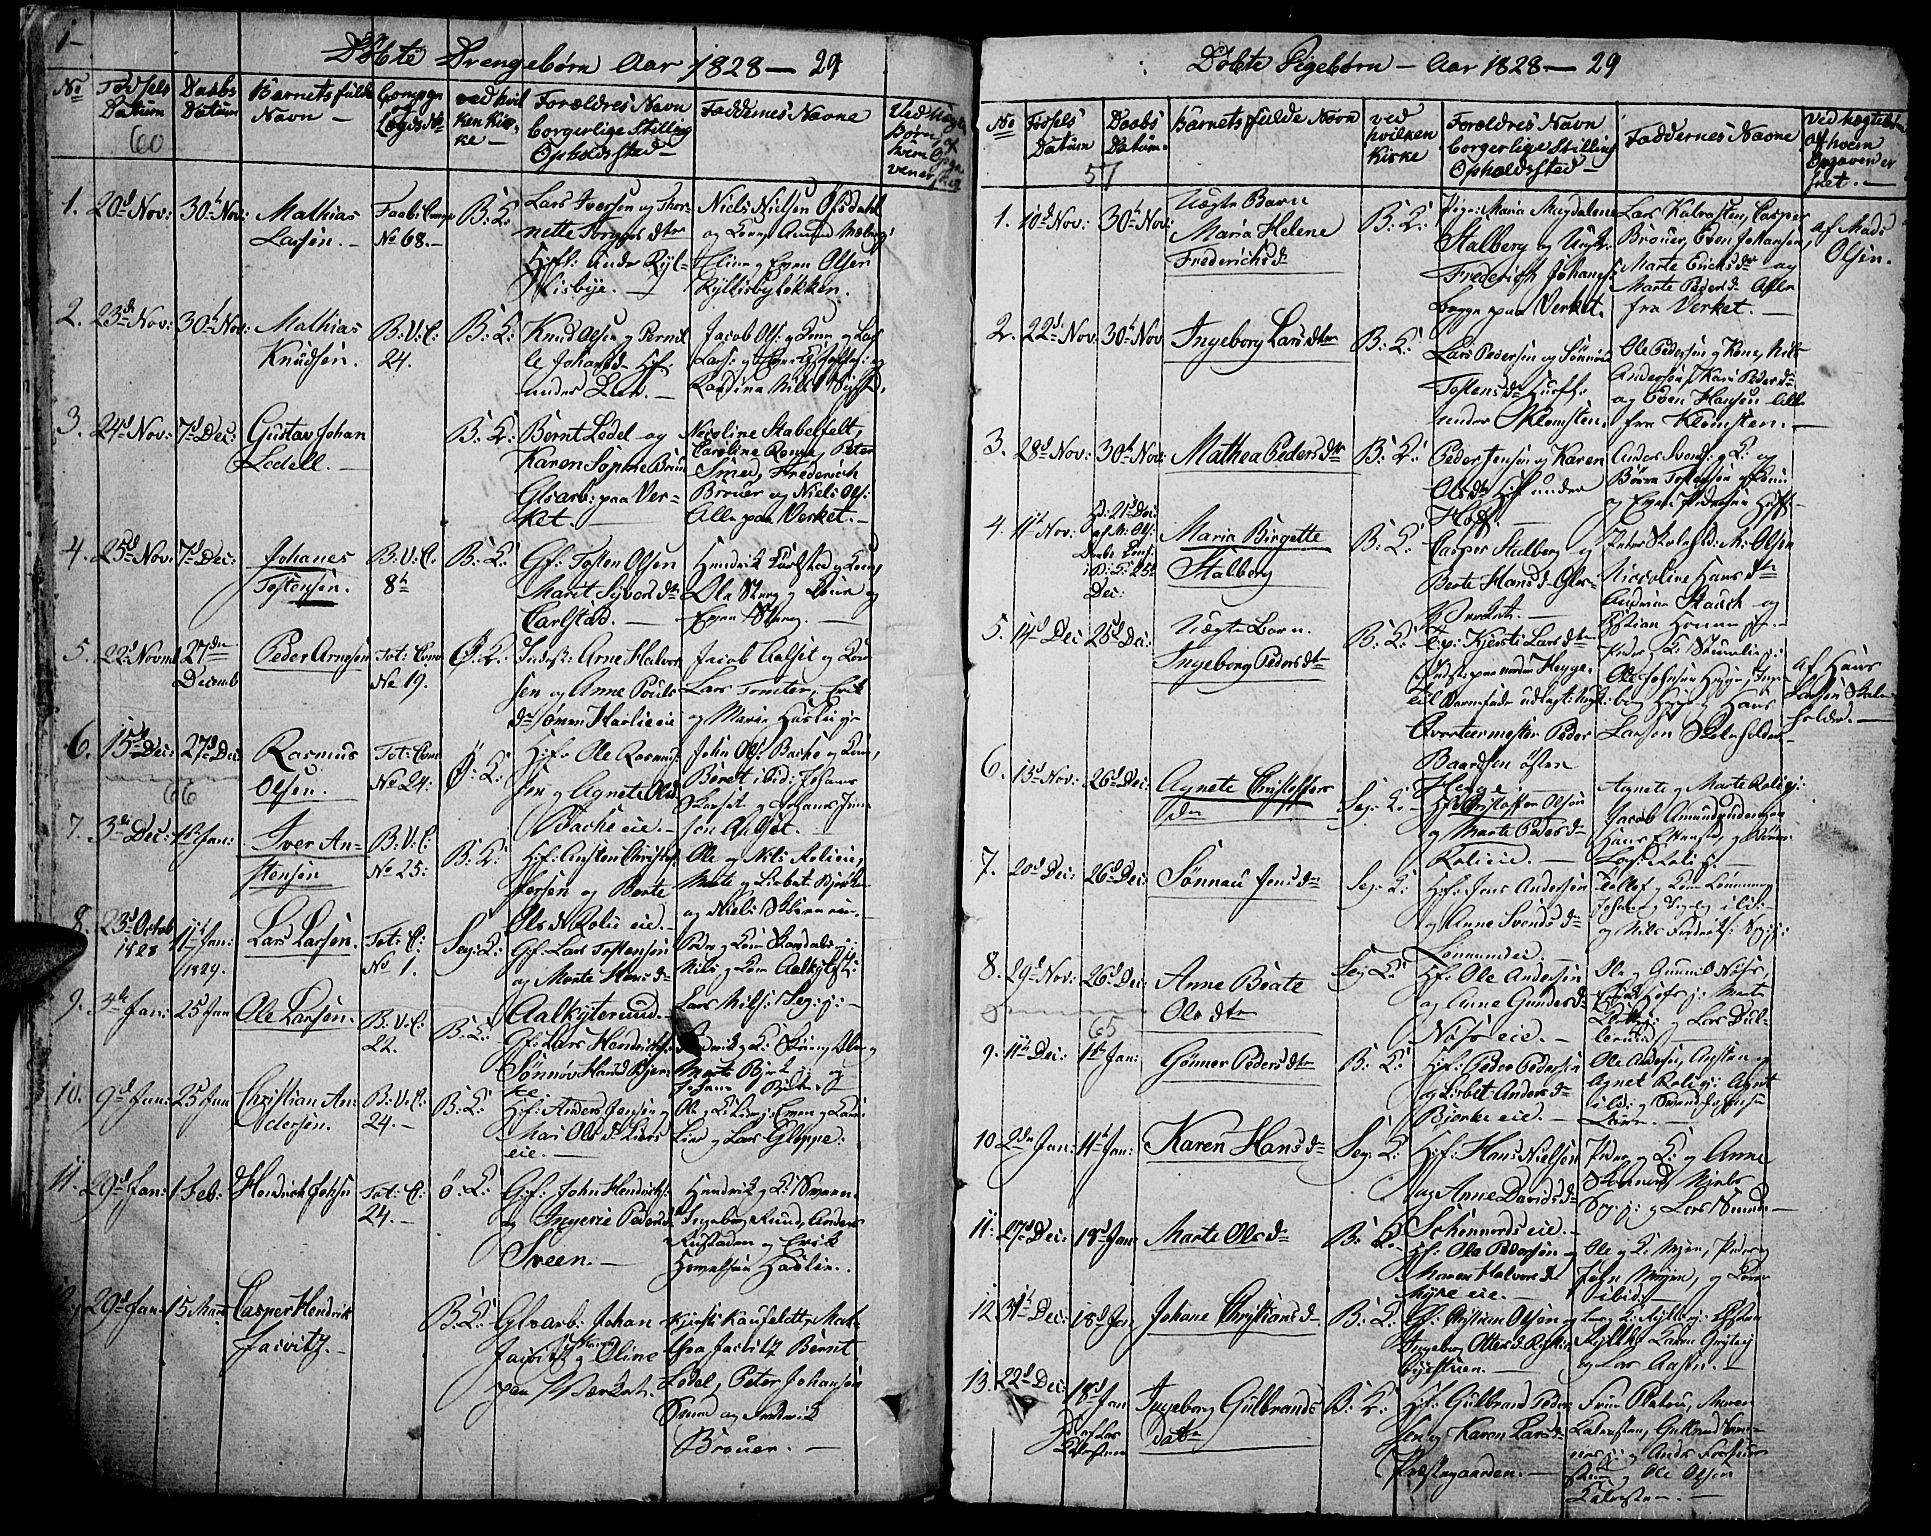 SAH, Biri prestekontor, Ministerialbok nr. 4, 1829-1842, s. 1